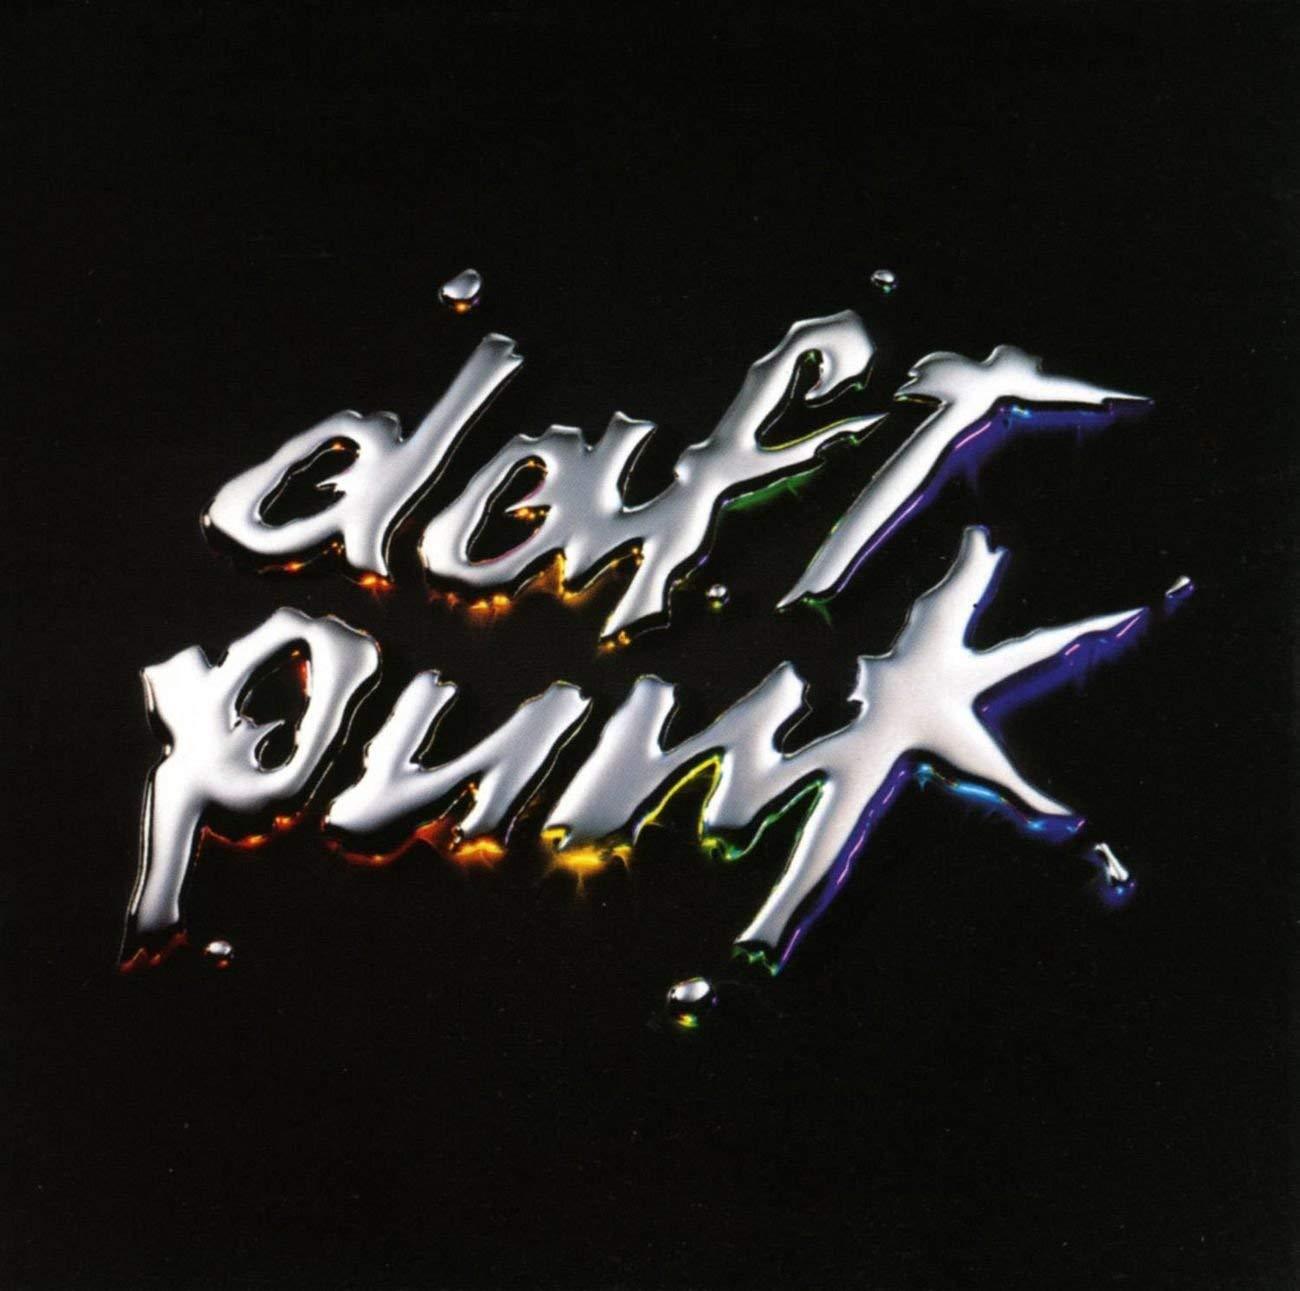 Discovery: Daft Punk